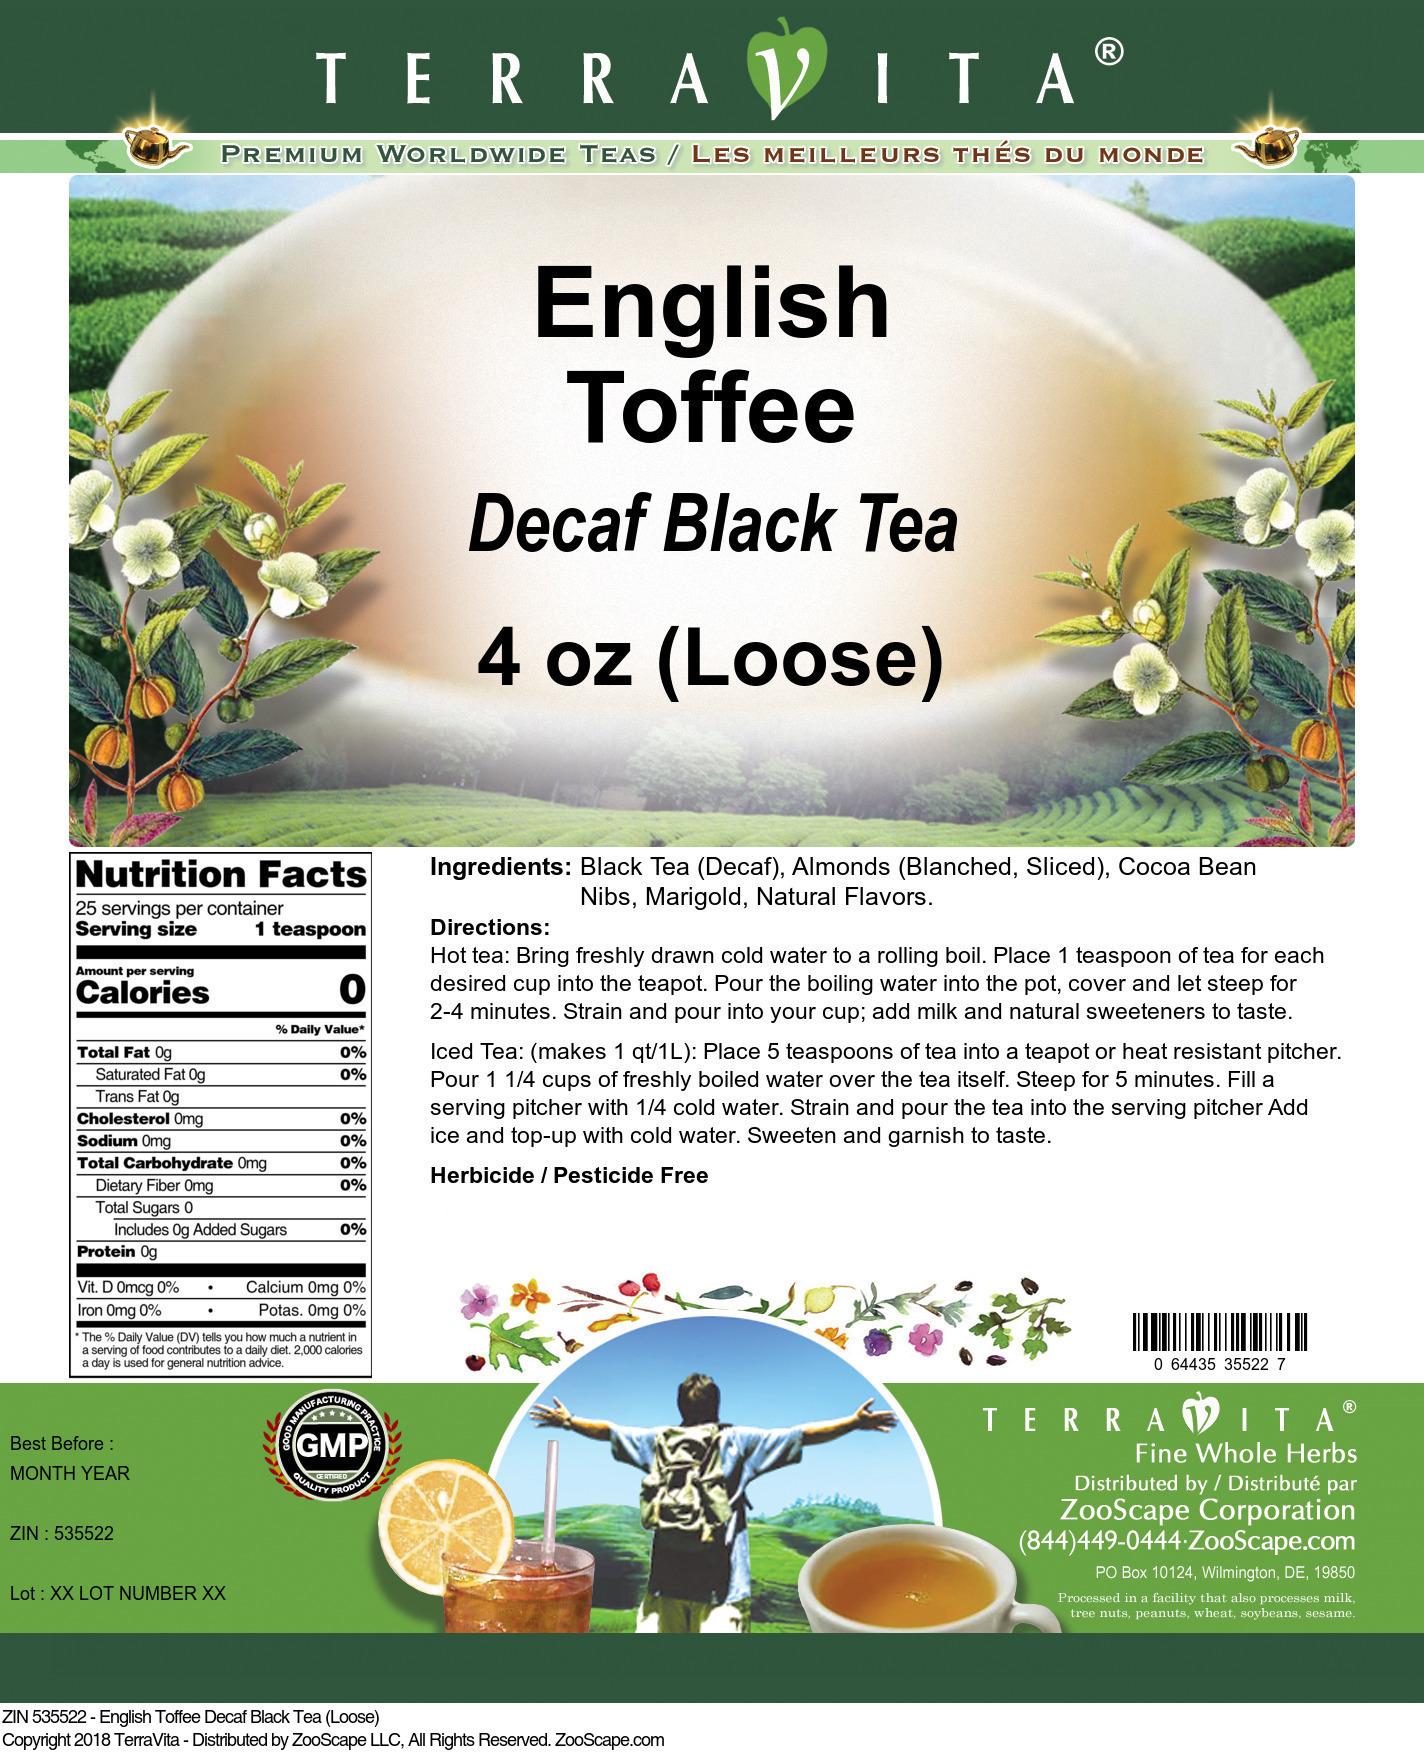 English Toffee Decaf Black Tea (Loose)